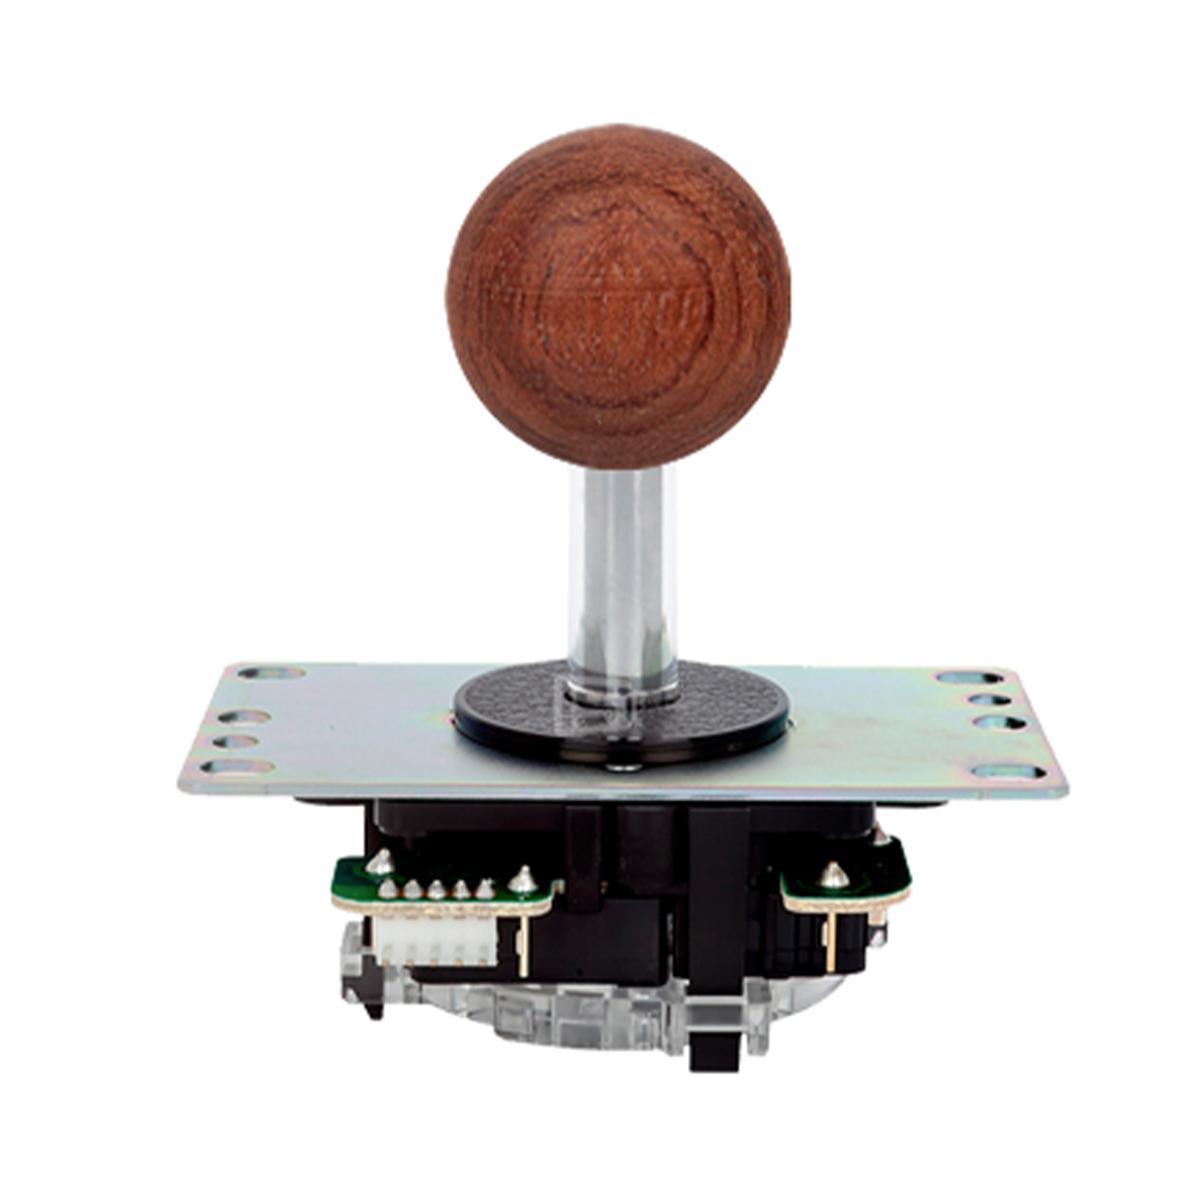 CROWN ウッド ボールトップ/バットトップ 三和製を始め多くのレバーに取付可能